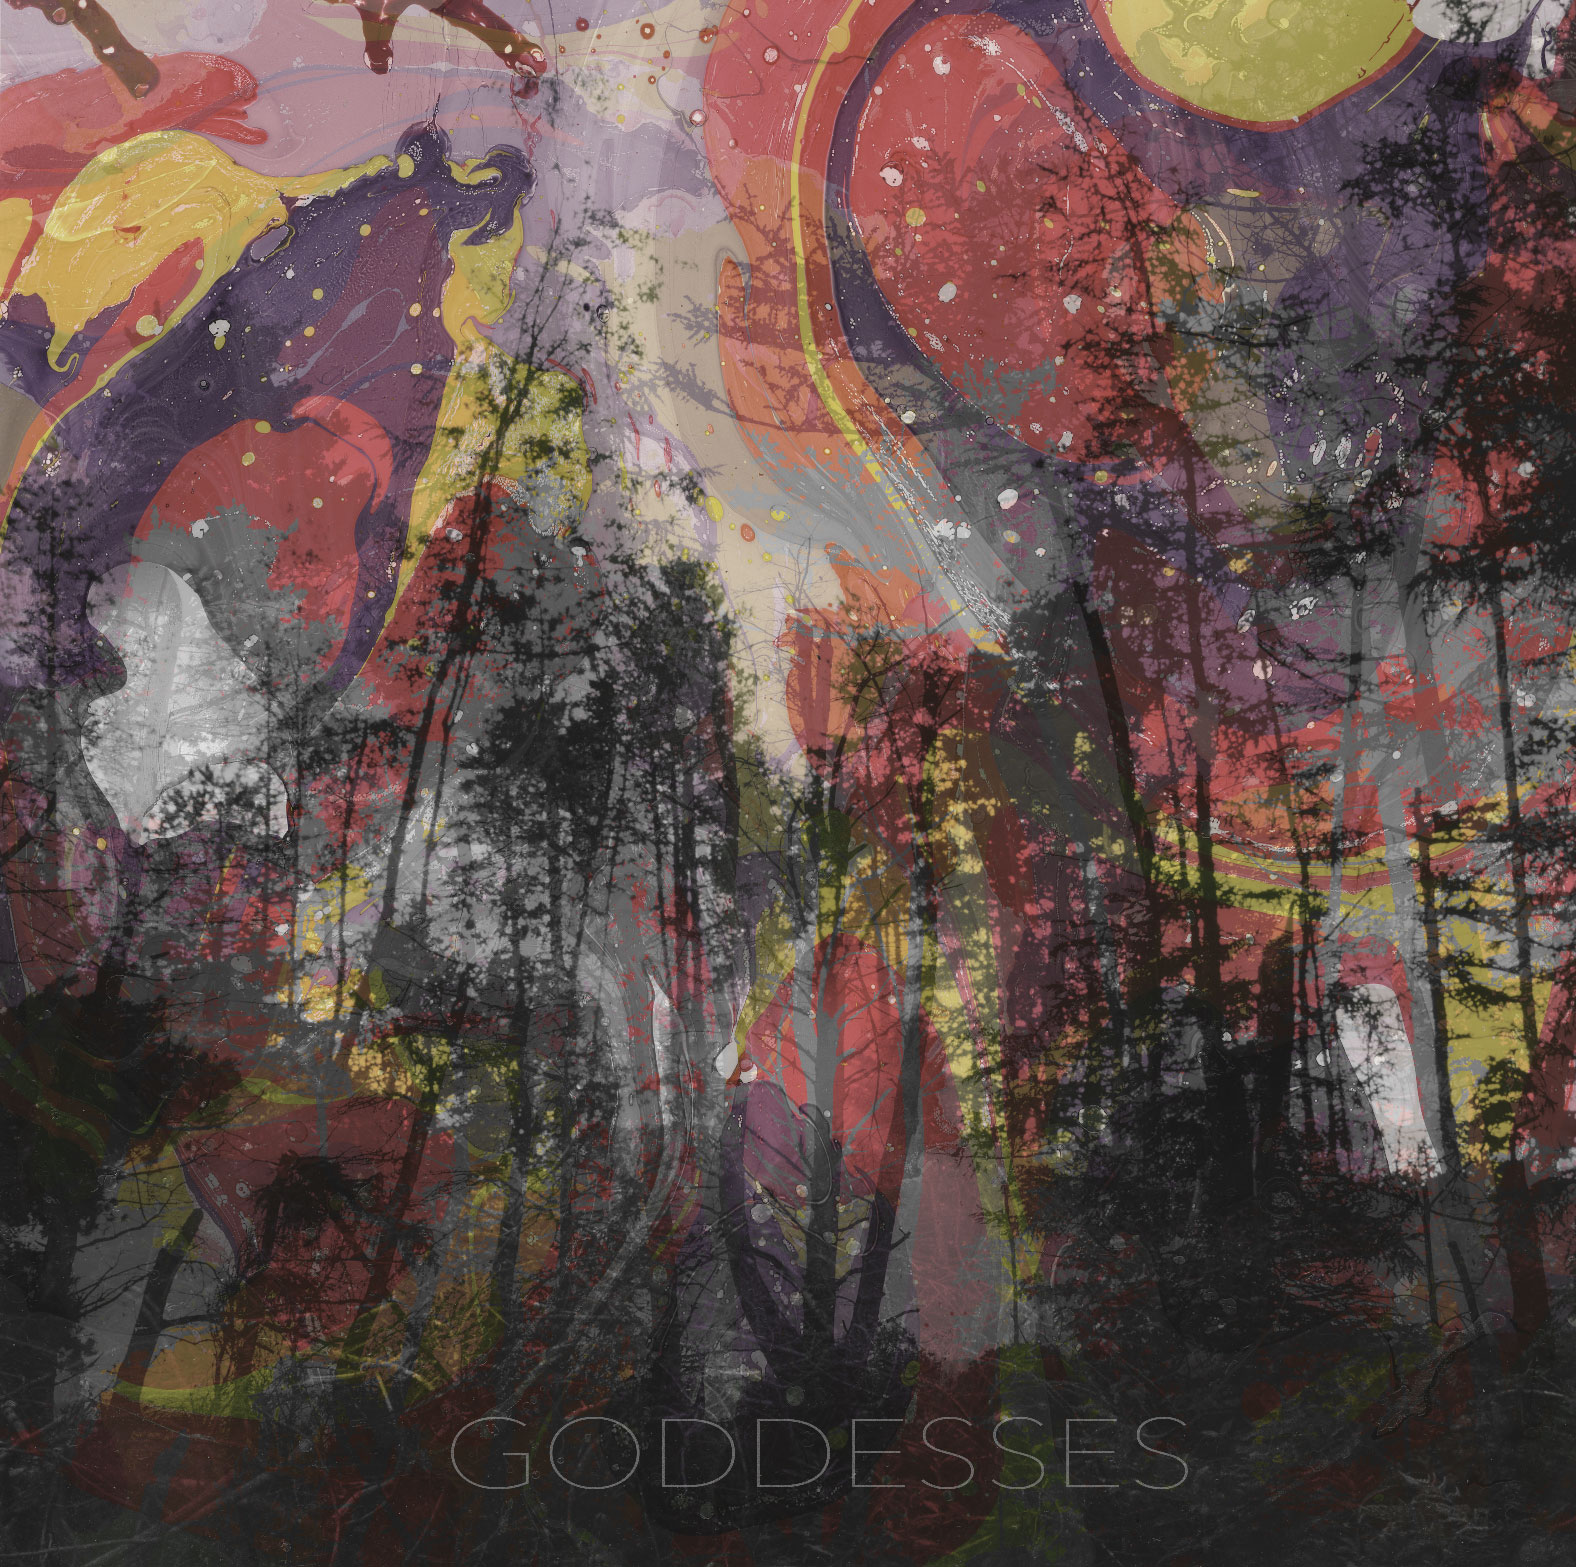 Goddesses album cover